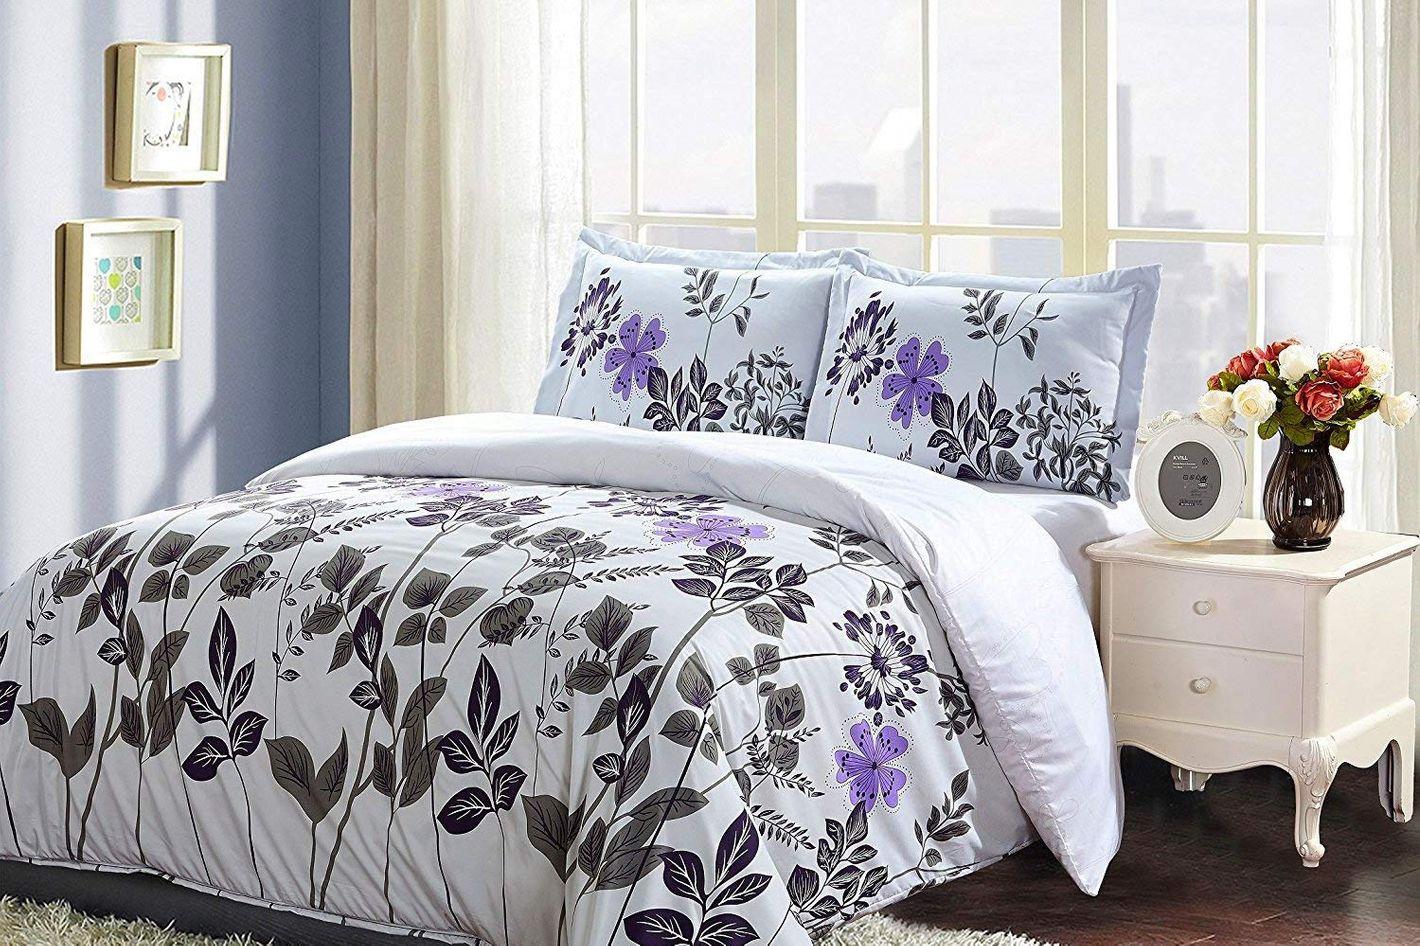 Utopia Bedding Printed Duvet Cover Set